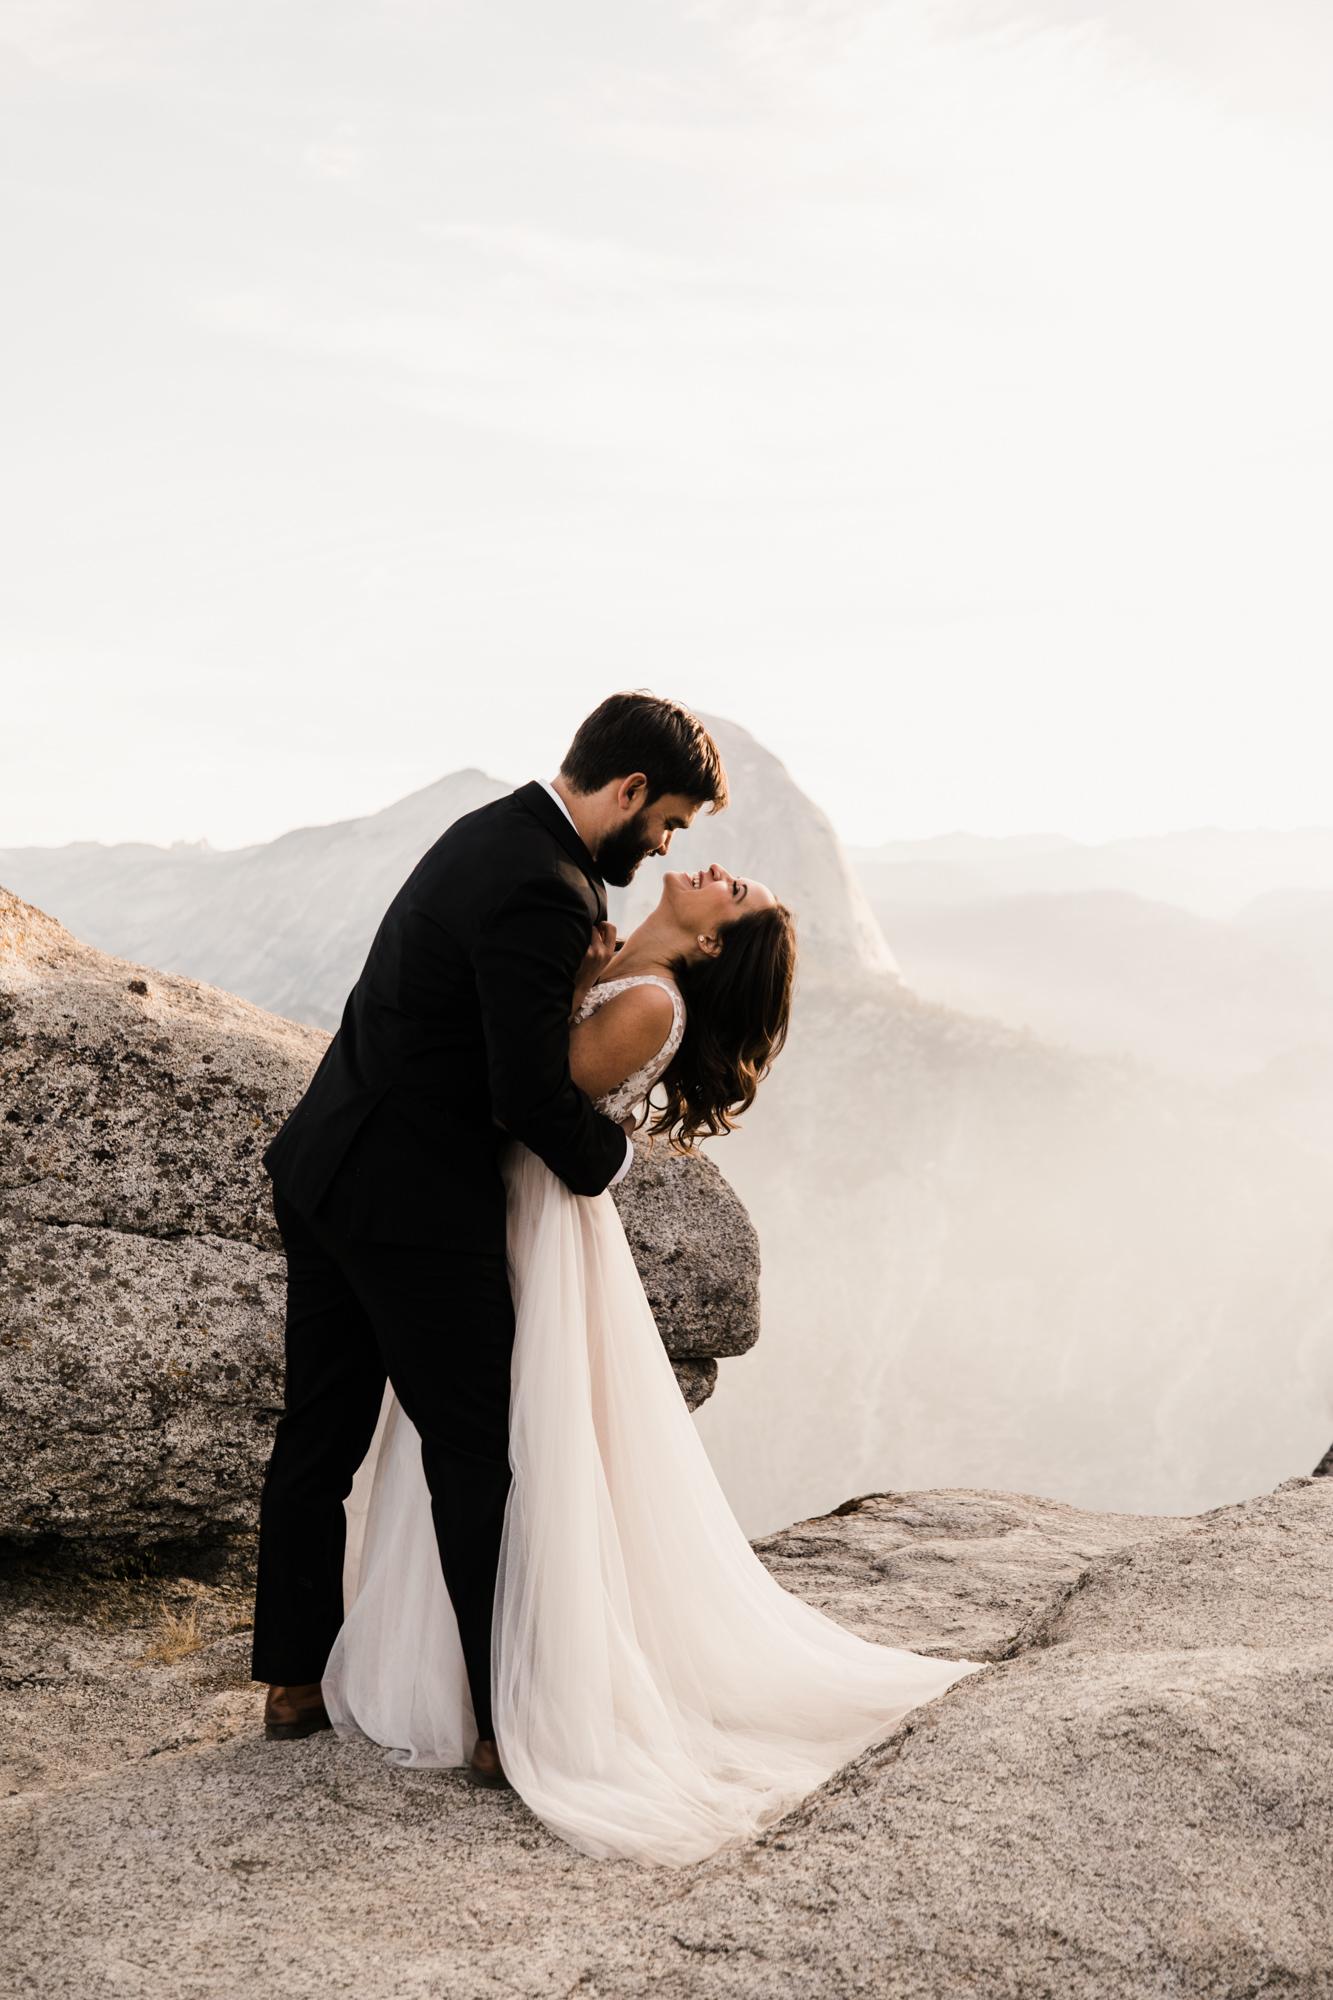 intimate yosemite elopement | destination adventure wedding photographers | the hearnes adventure photography | www.thehearnes.com